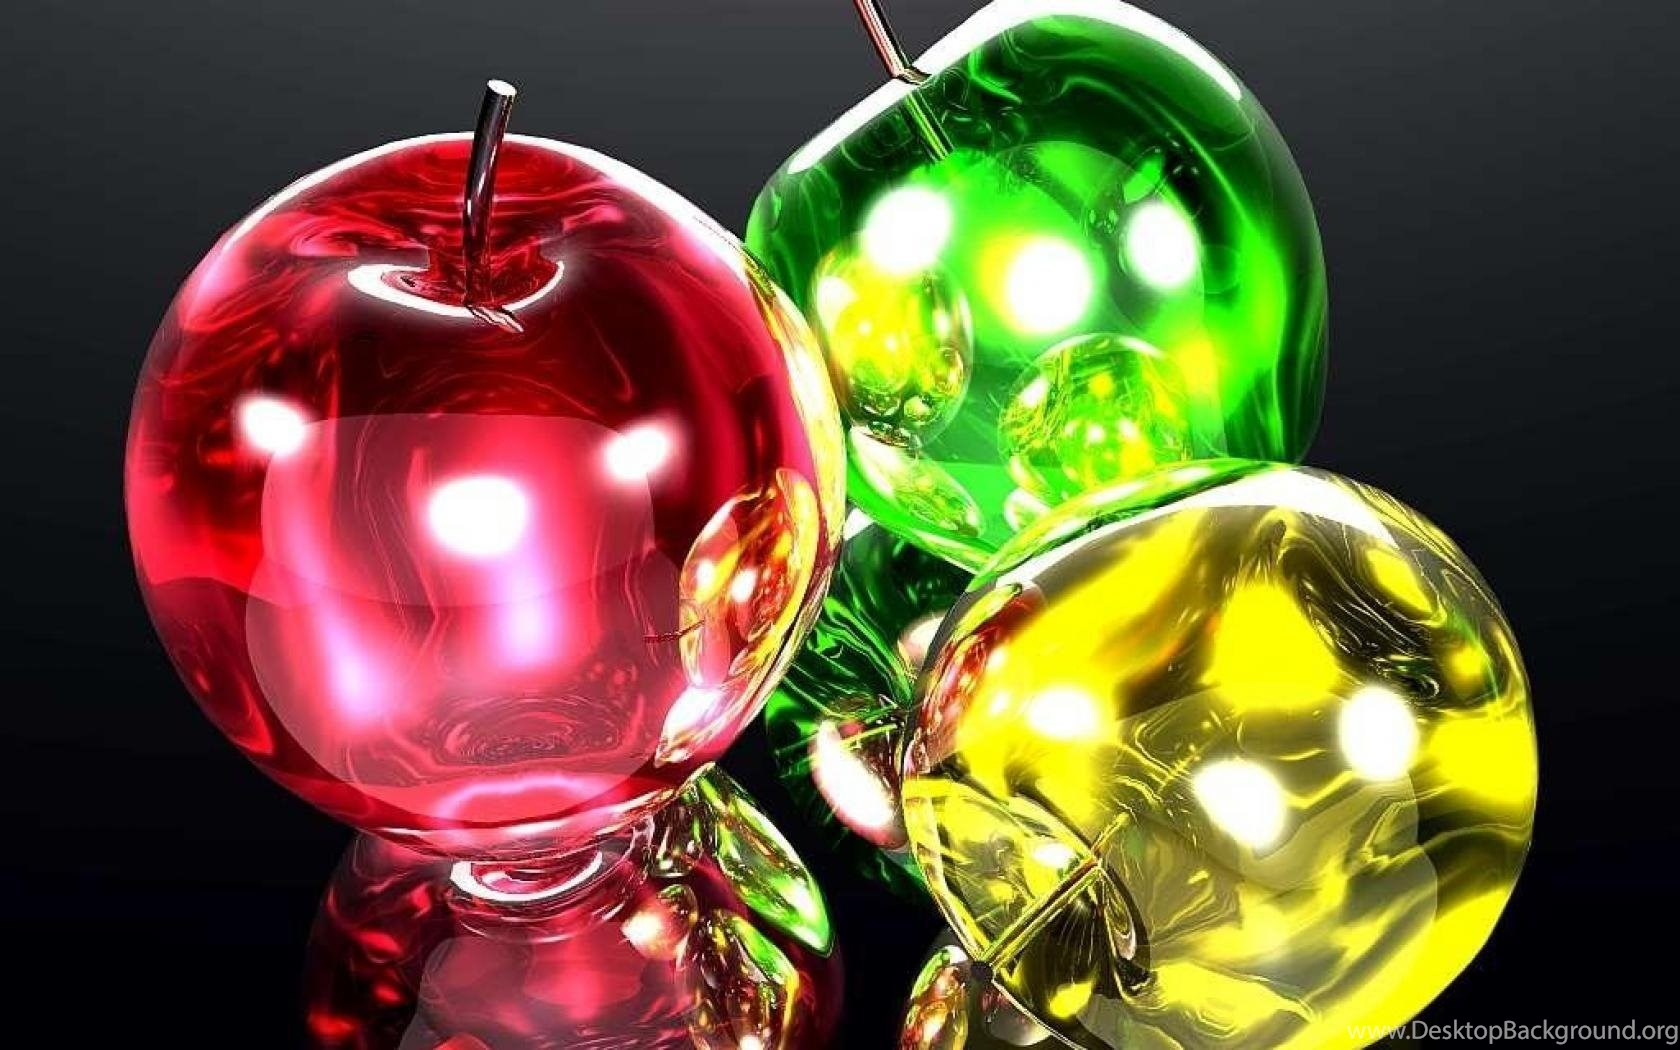 the glass apples wallpaper ( desktop background